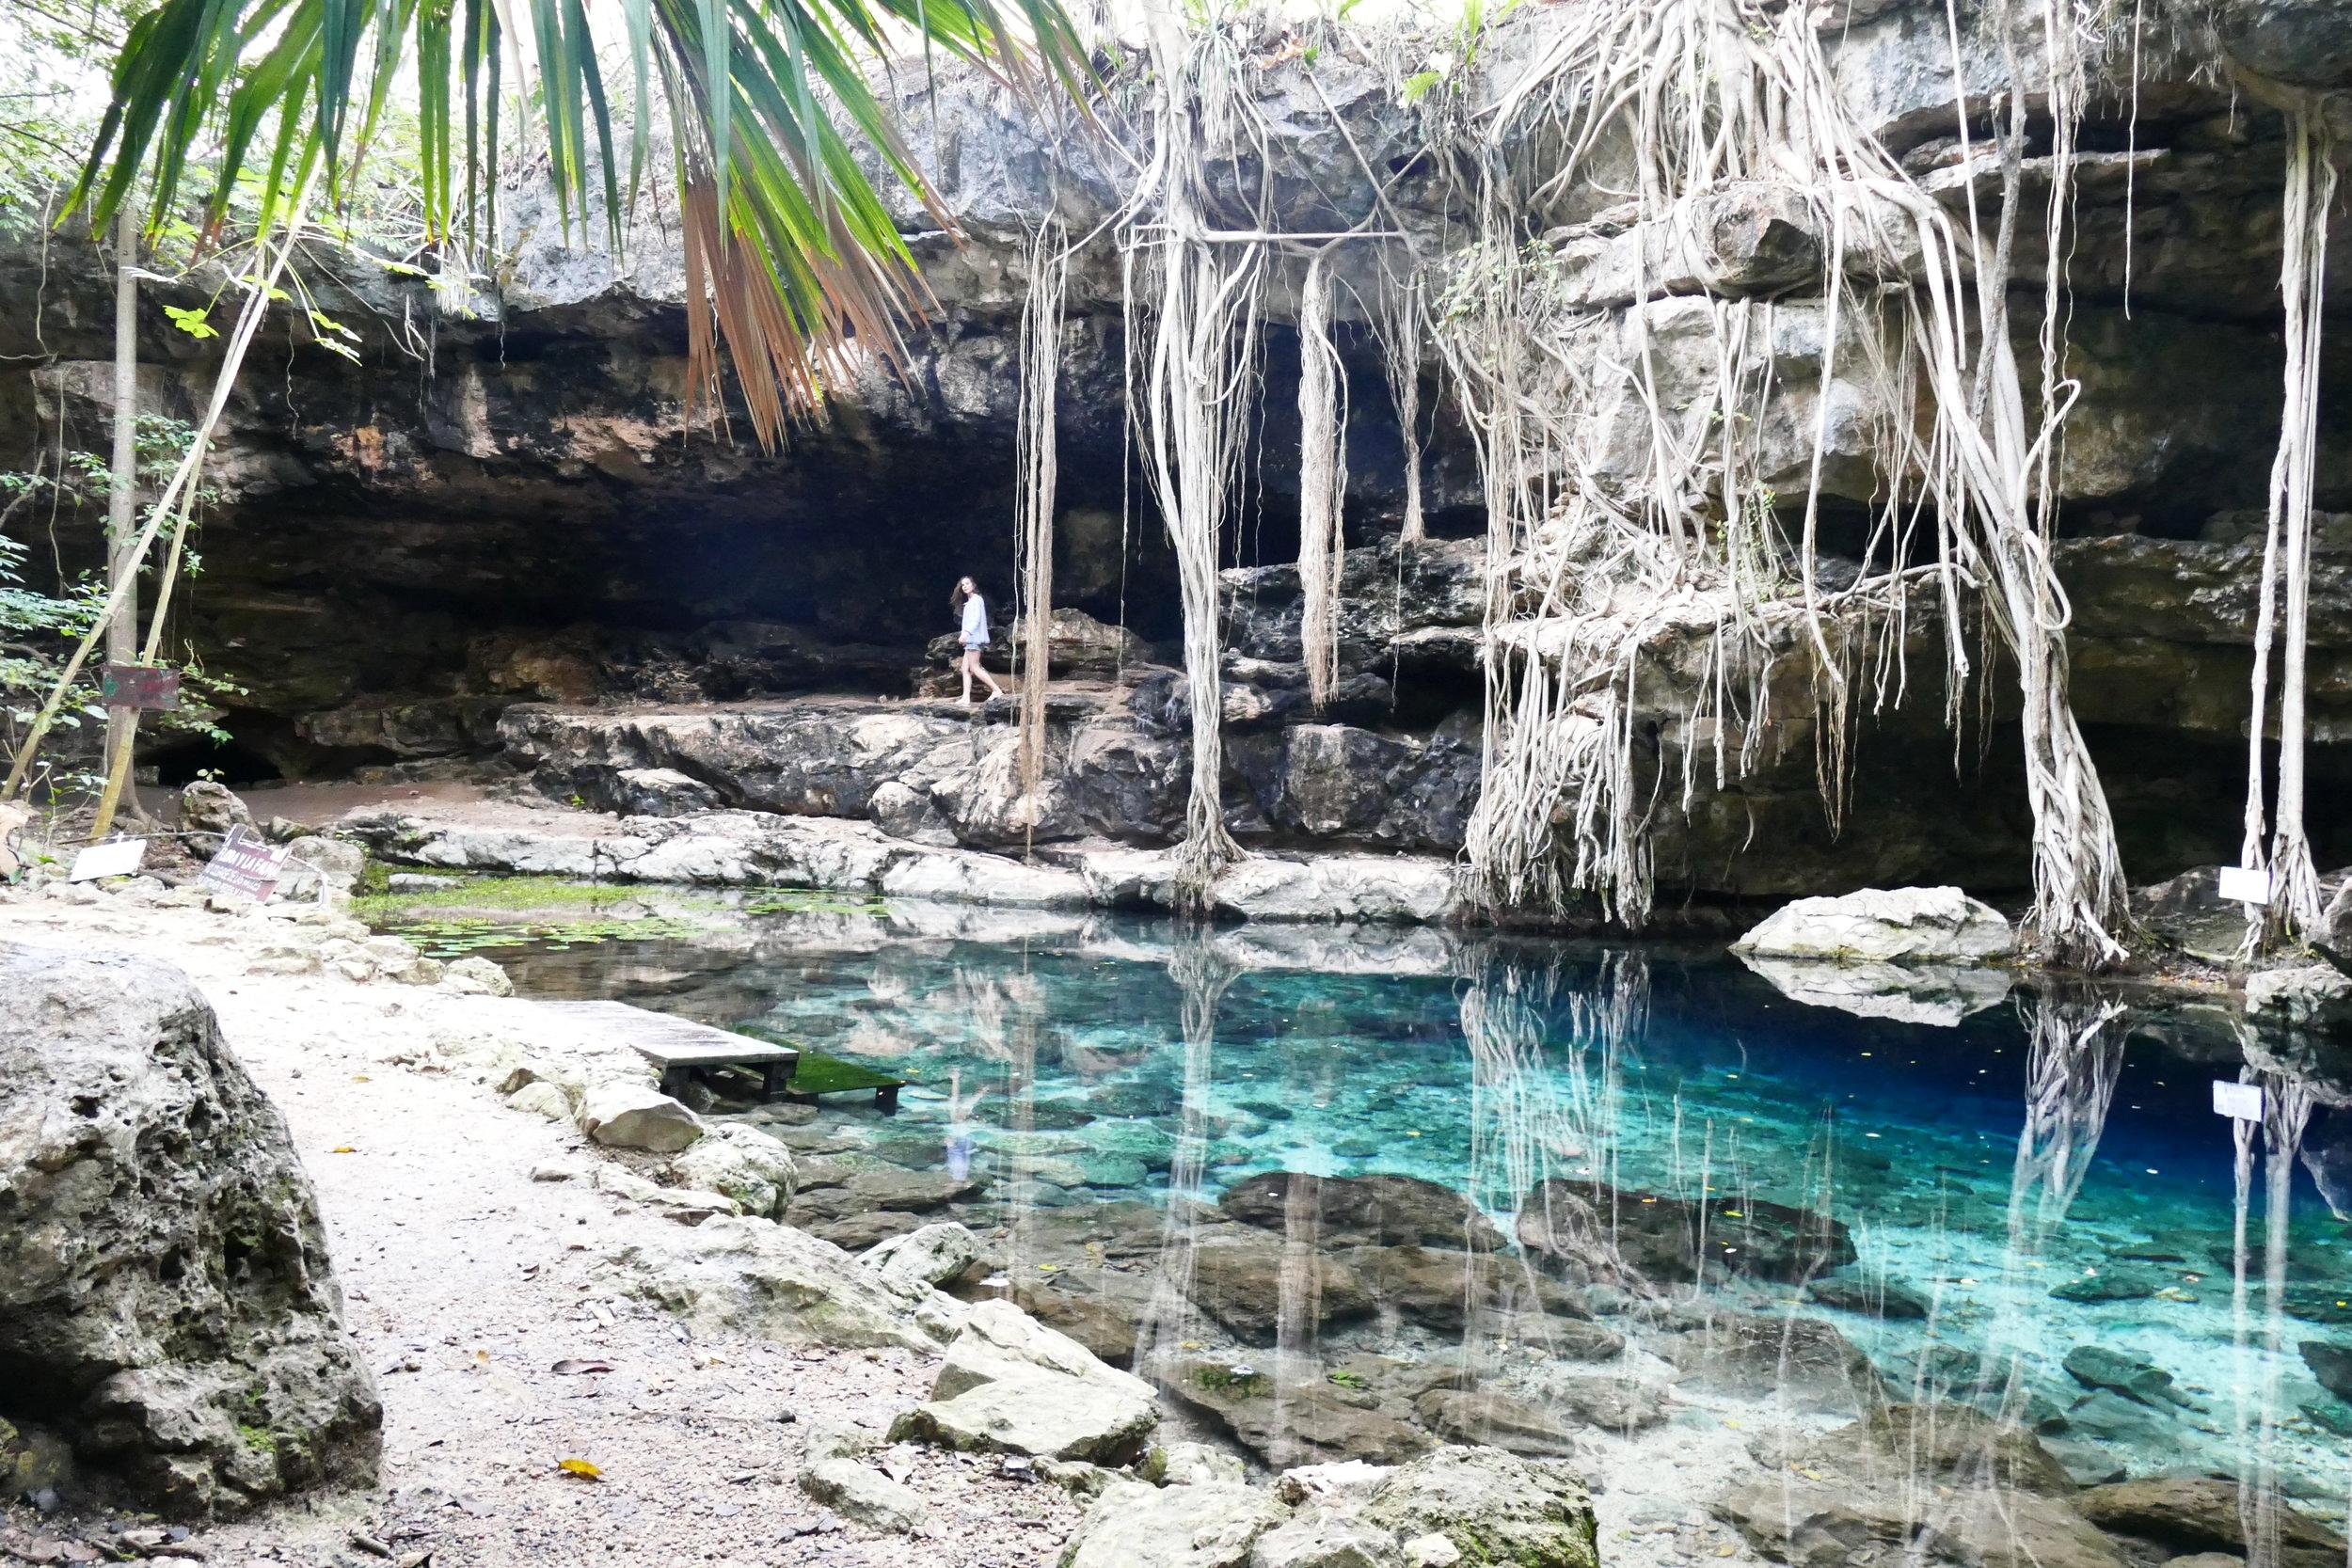 Cenote Xbatun Mexico (154).JPG